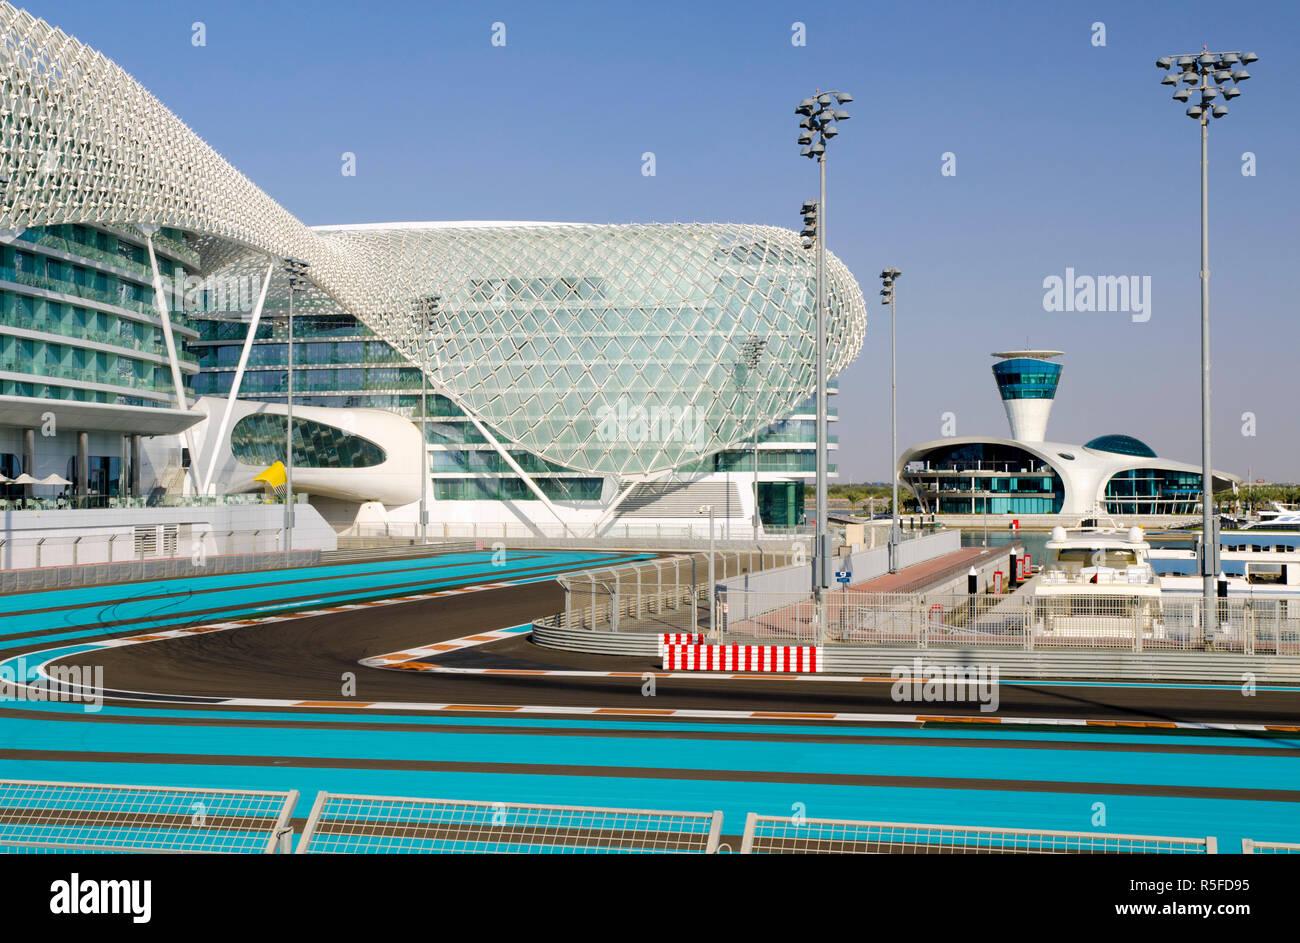 United Arab Emirates, Abu Dhabi, Yas Island, The Yas Hotel and Yas Marina Grand Prix Motor Racing Circuit Stock Photo